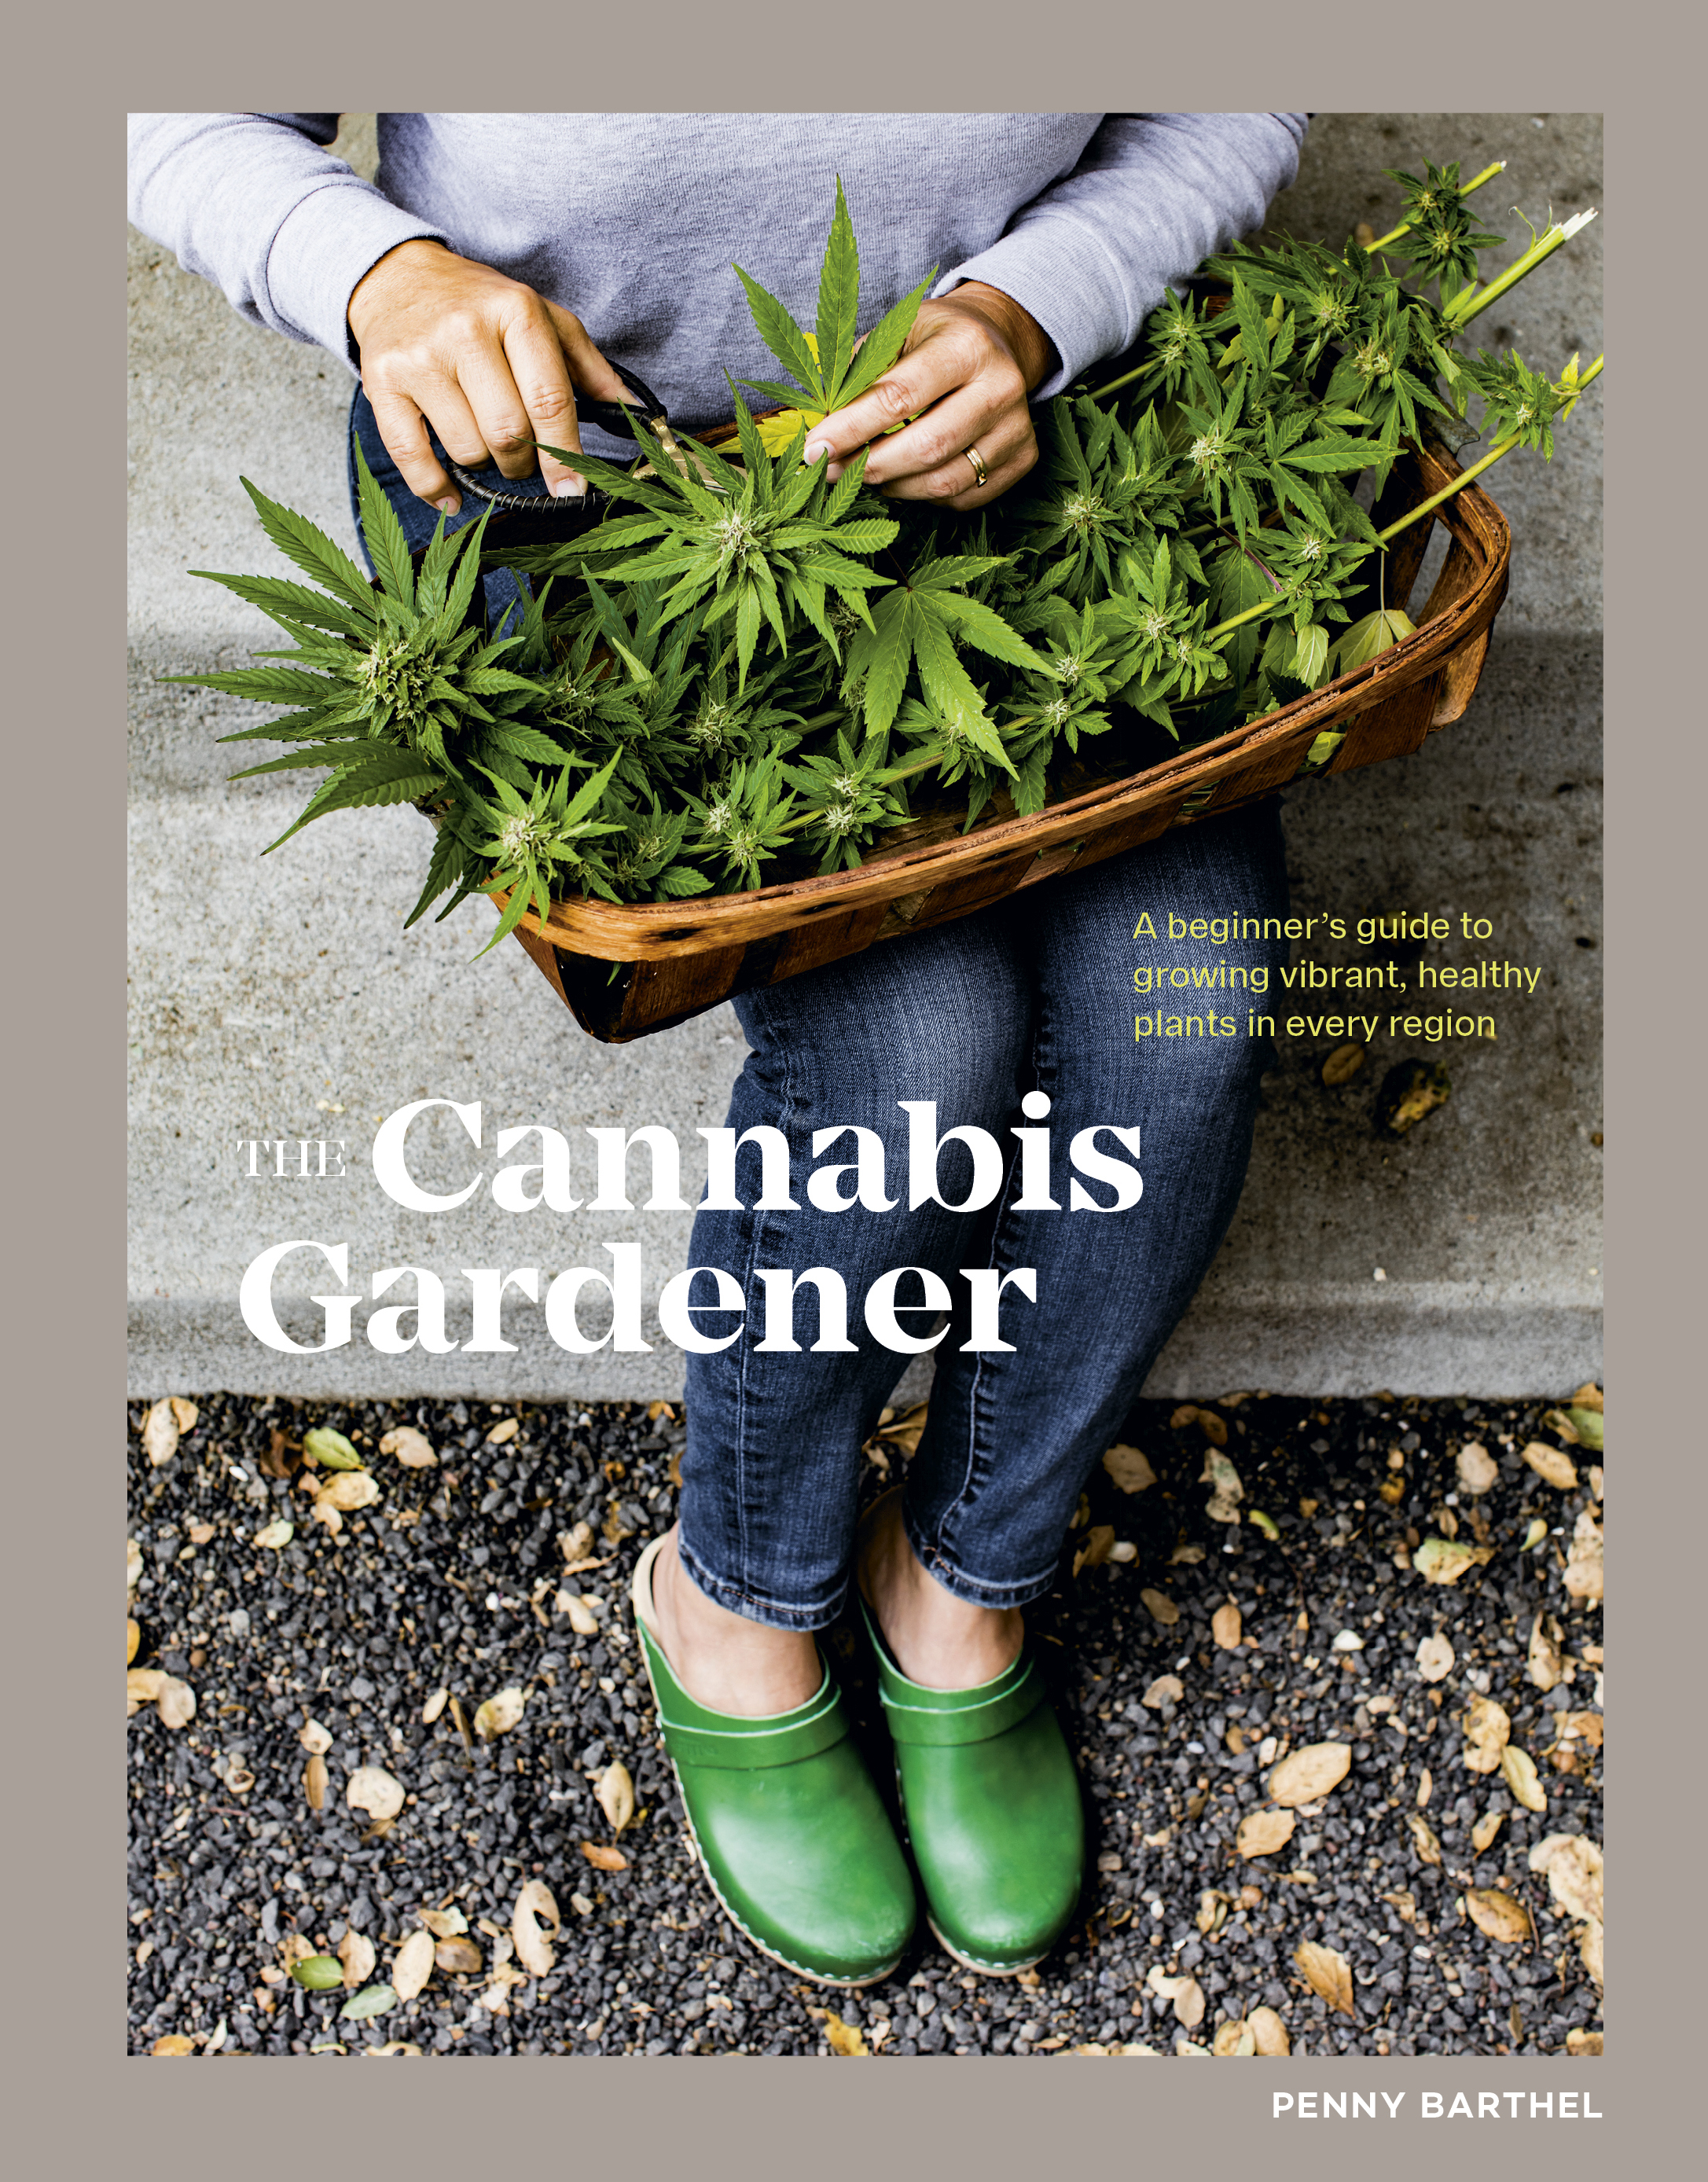 BART_CannabisGardener_Cover_EDW_Final